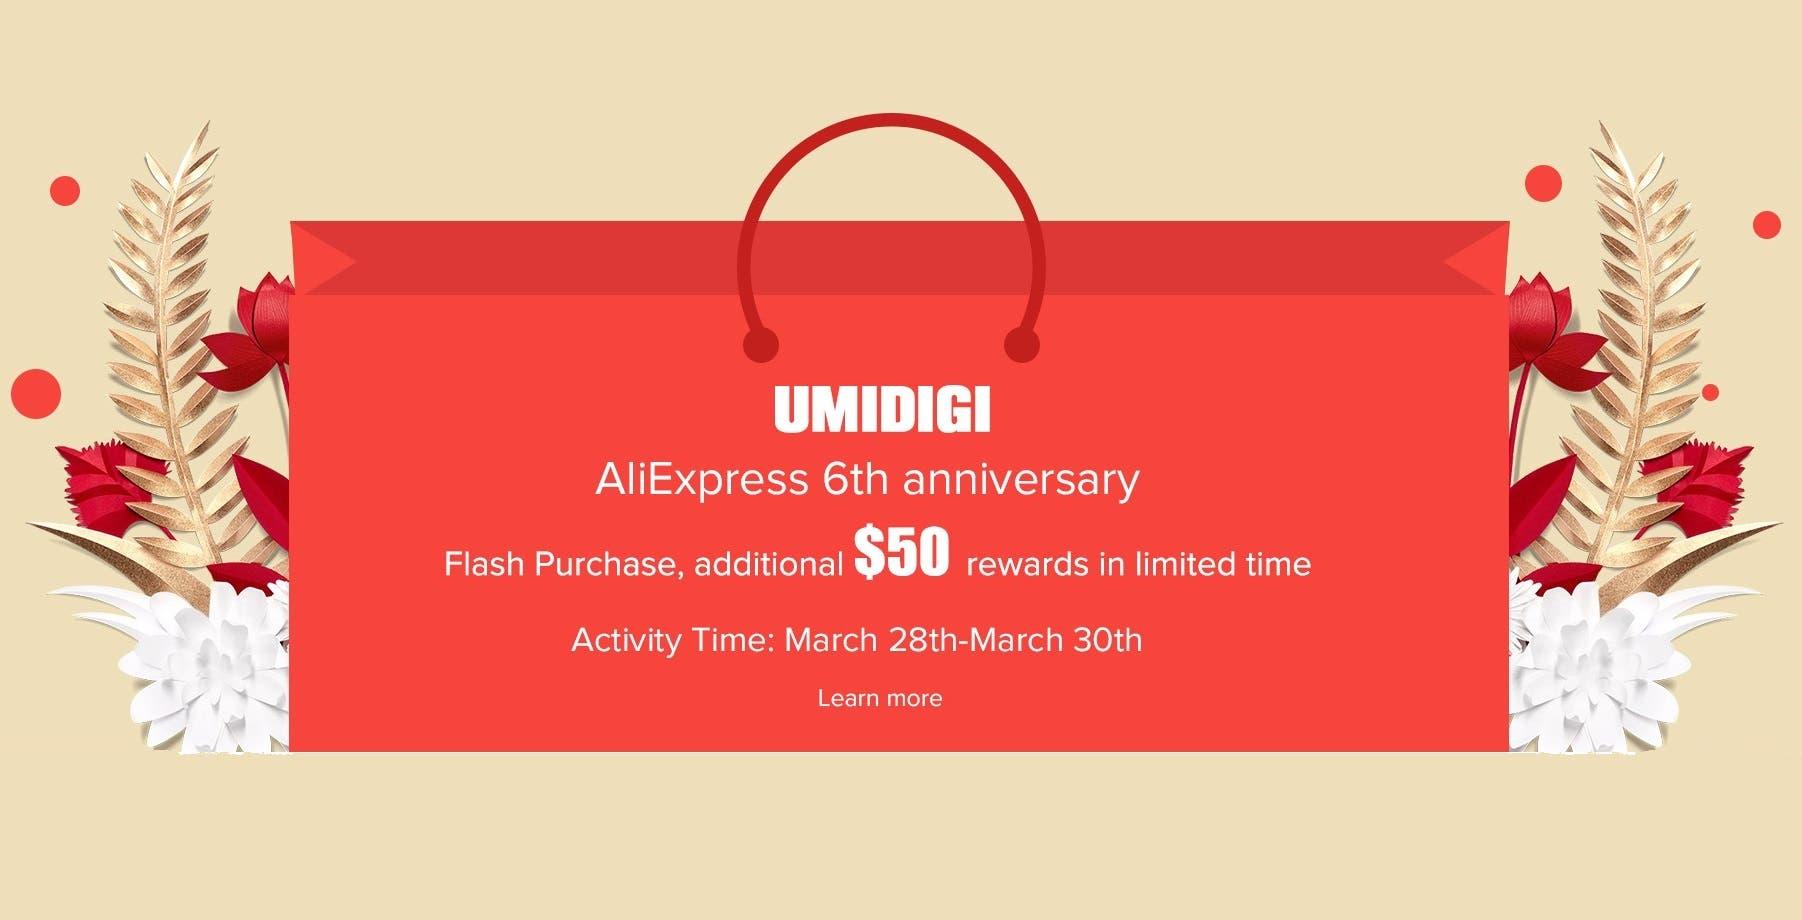 UMIDIGI's AliExpress Anniversary